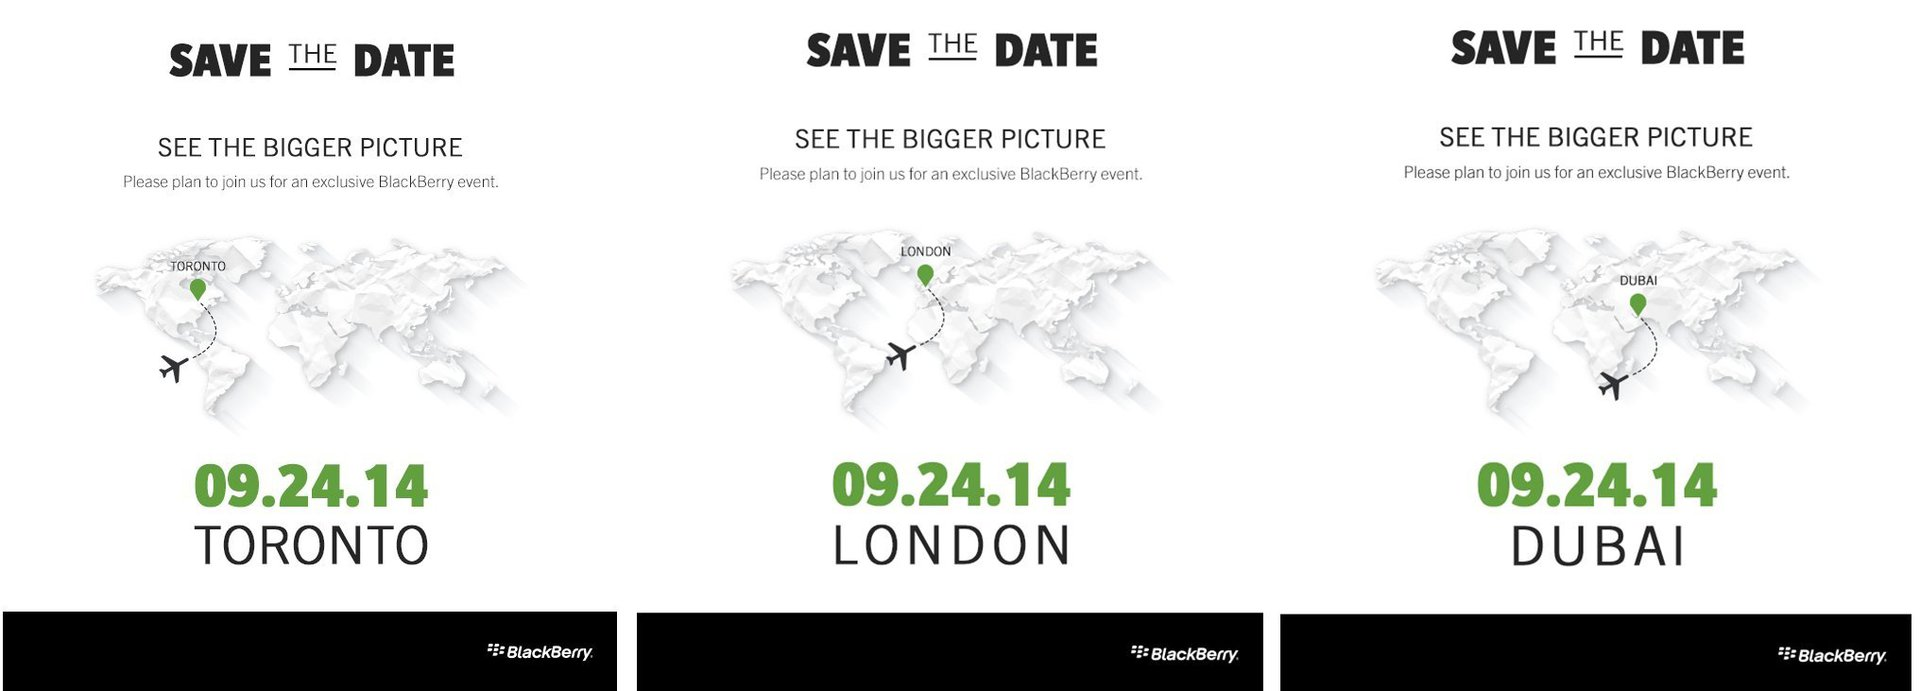 Презентация BlackBerry Passport назначена на 24.09.2014